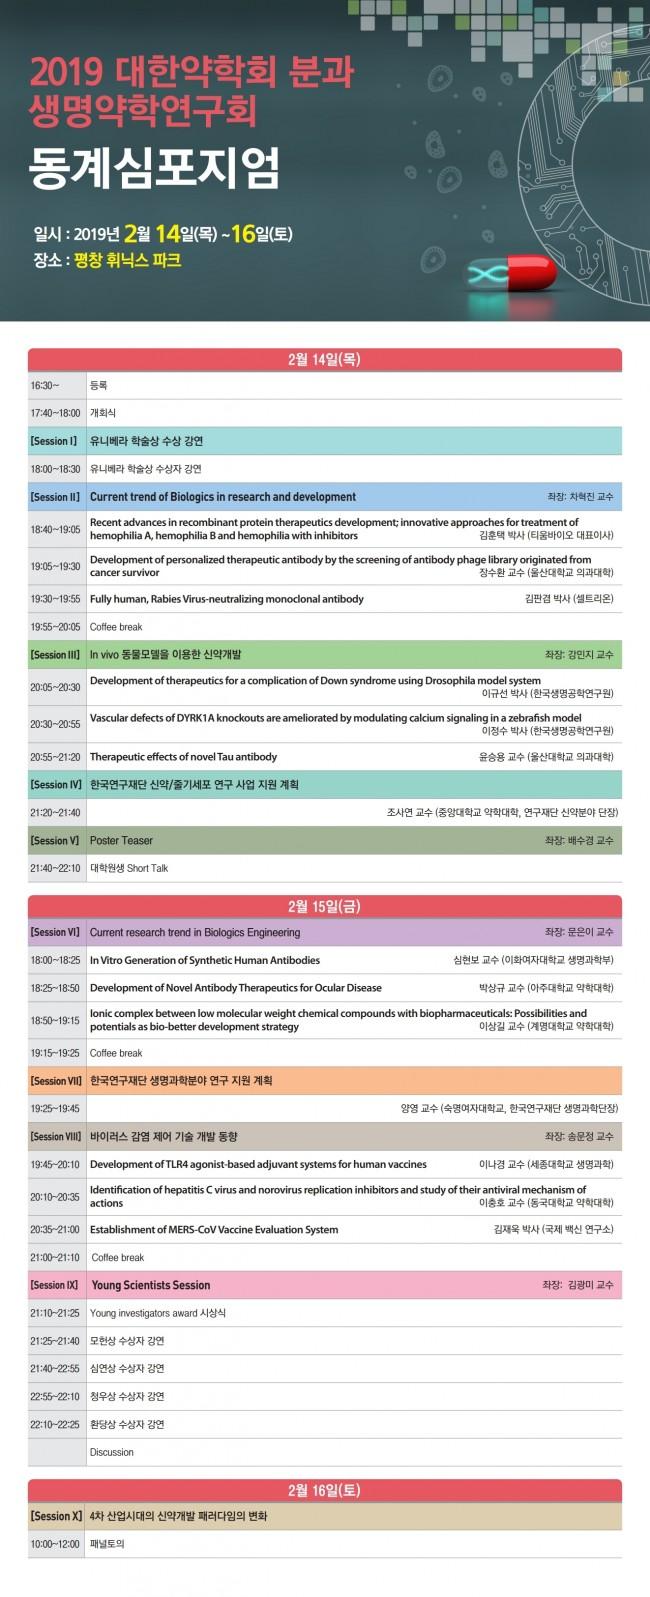 s371_2019대한약학회_생명약학연구회동계심포지엄.jpg